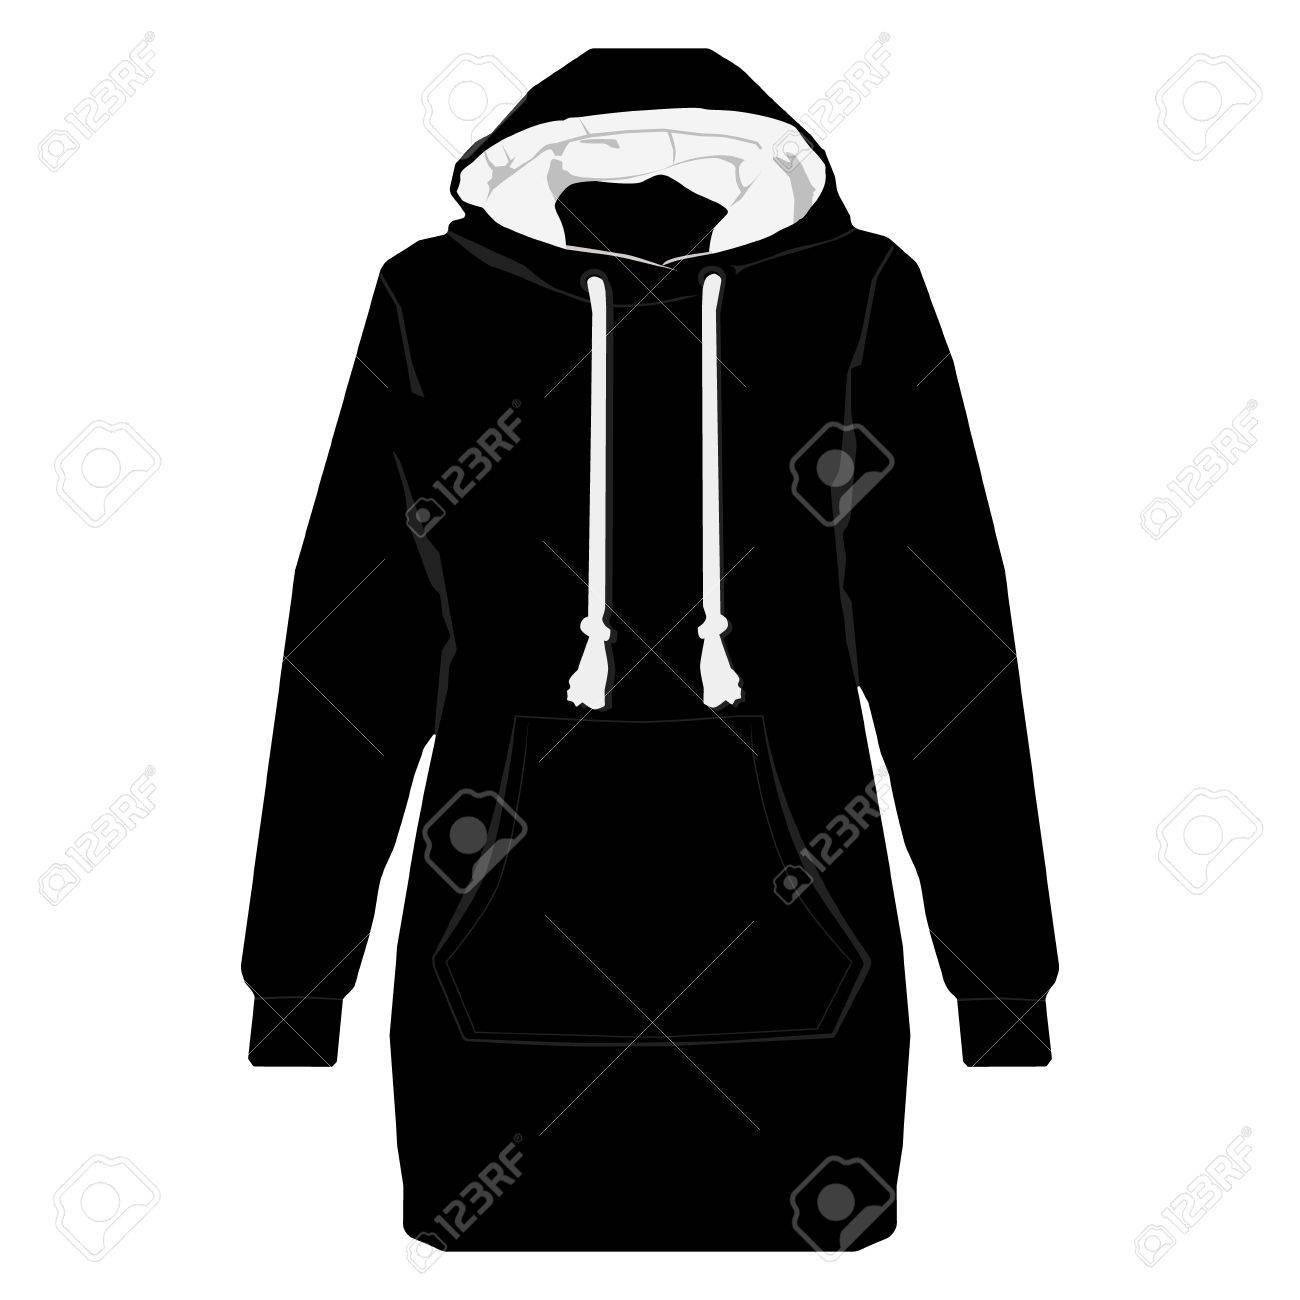 Illustration Black Unisex Sport Jacket With Long Sleeves Pocket